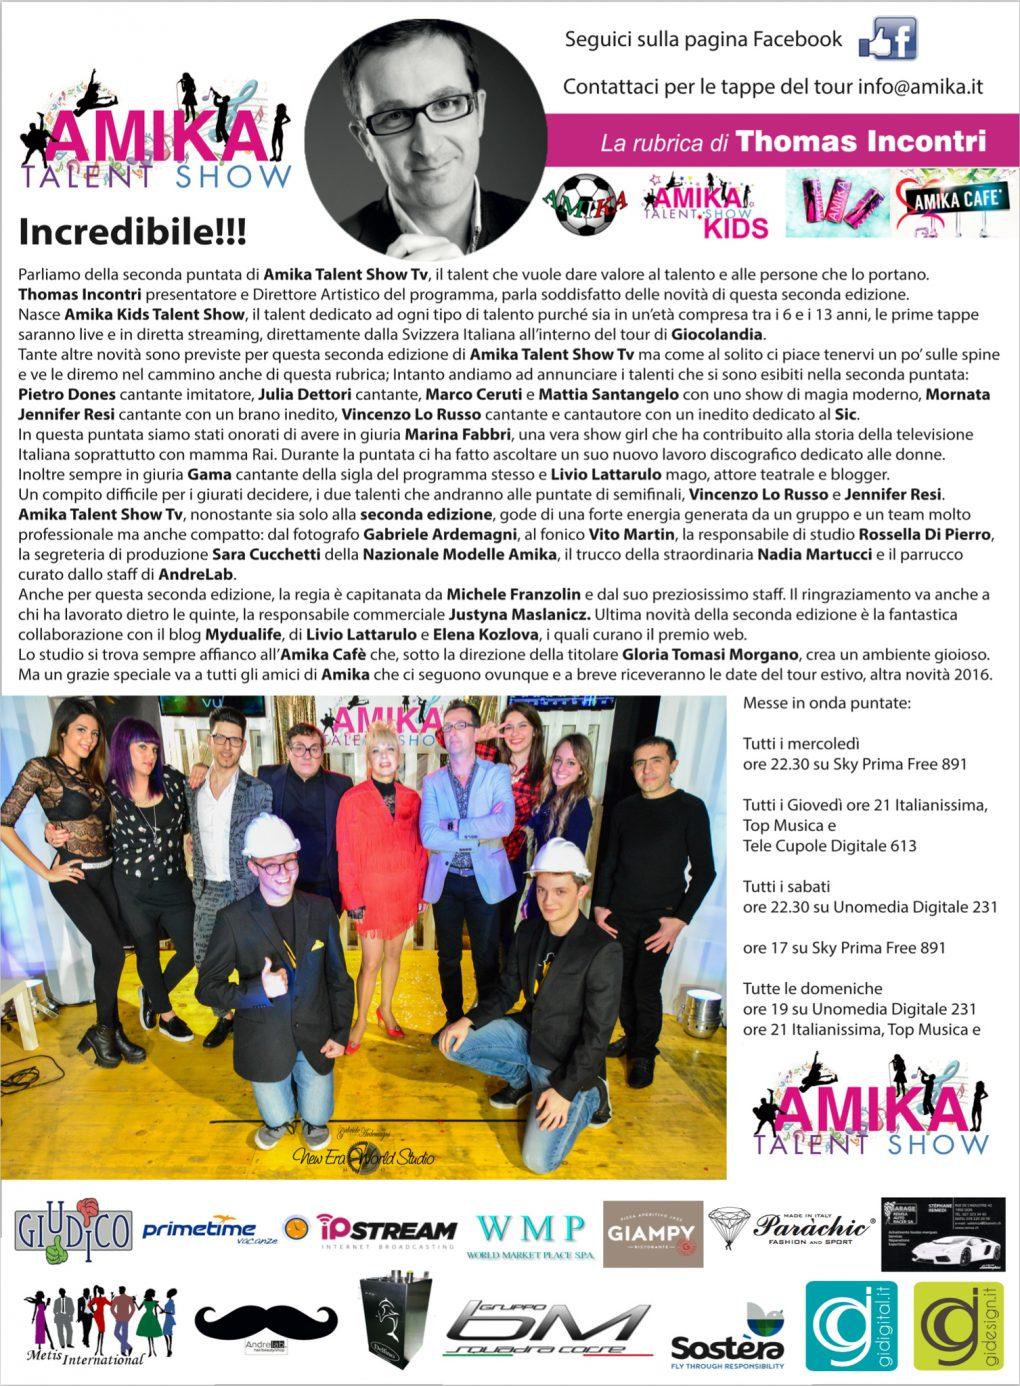 Vip 2016 Amika Talent Show 2 Foto by Gabriele Ardemagni